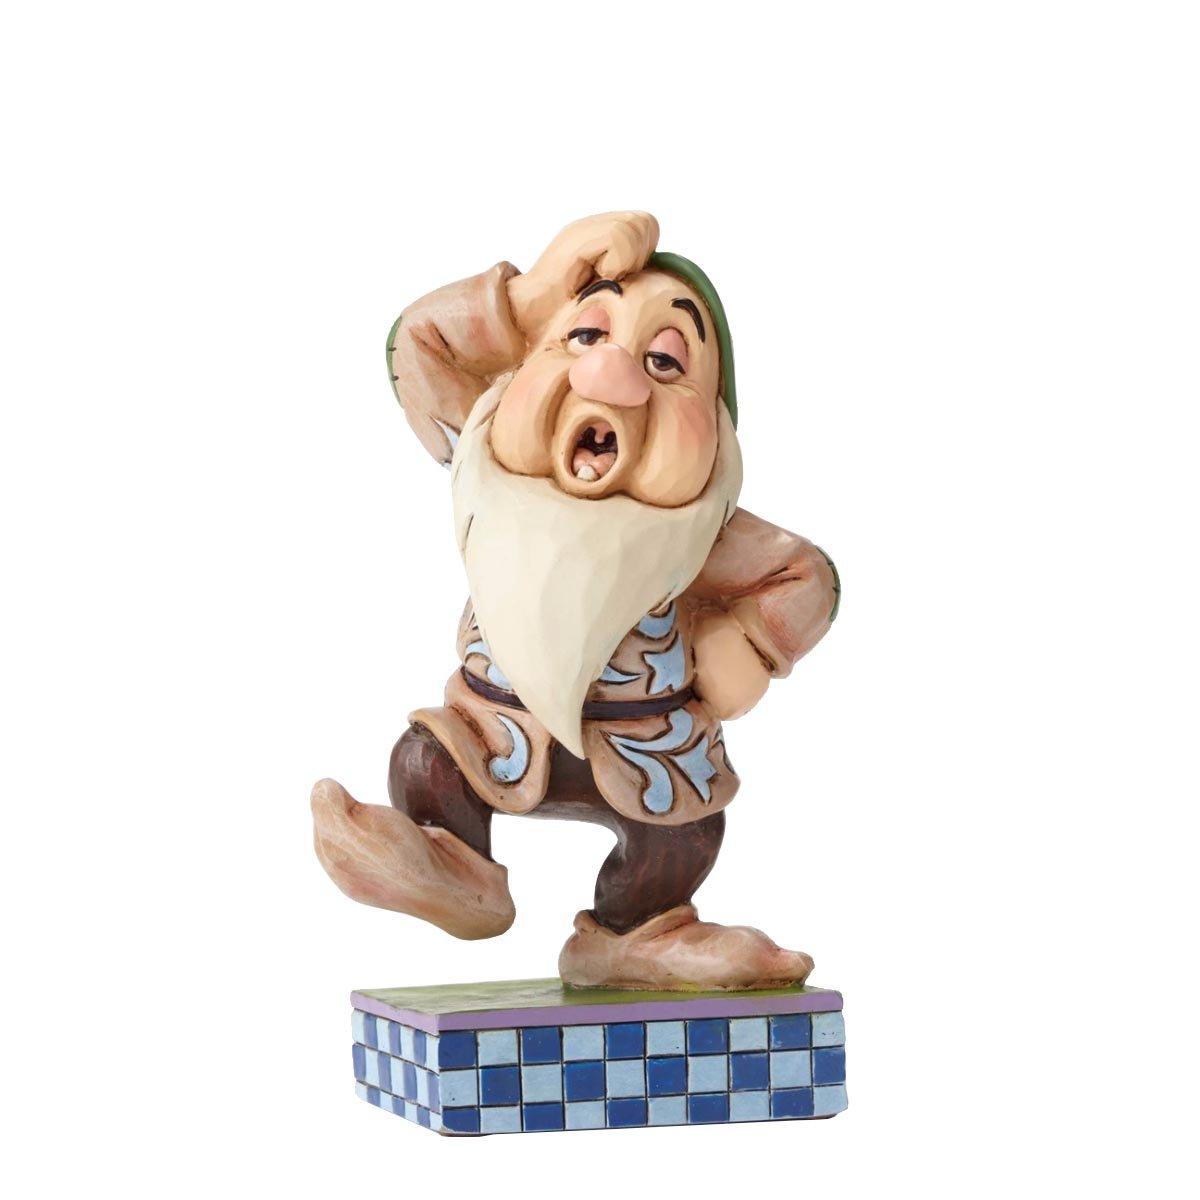 Disney Traditionen Sneezy Figur, mehrfarbig, 11 cm mehrfarbig